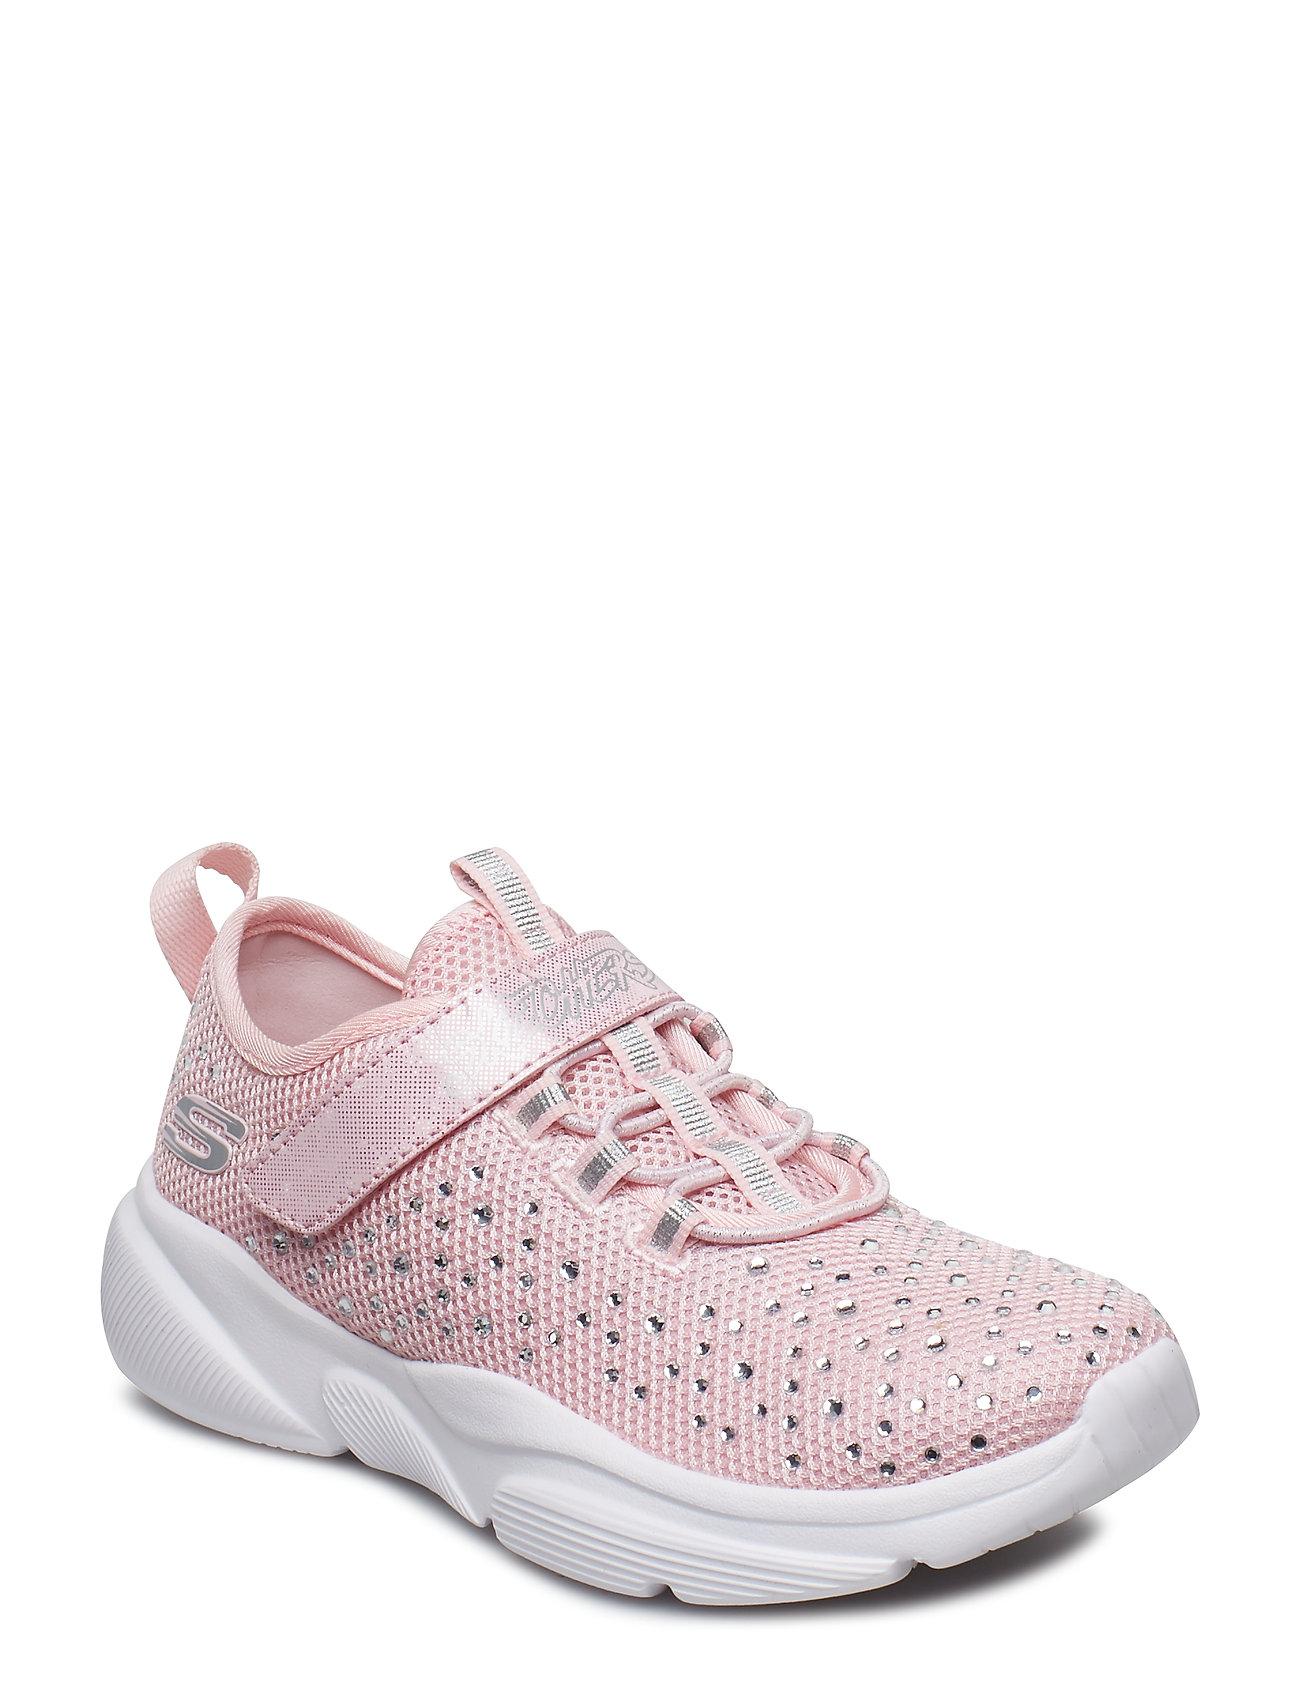 3a858bbd0b5 LTPK LIGHT PINK Skechers Girls Meridian sneakers for børn - Pashion.dk